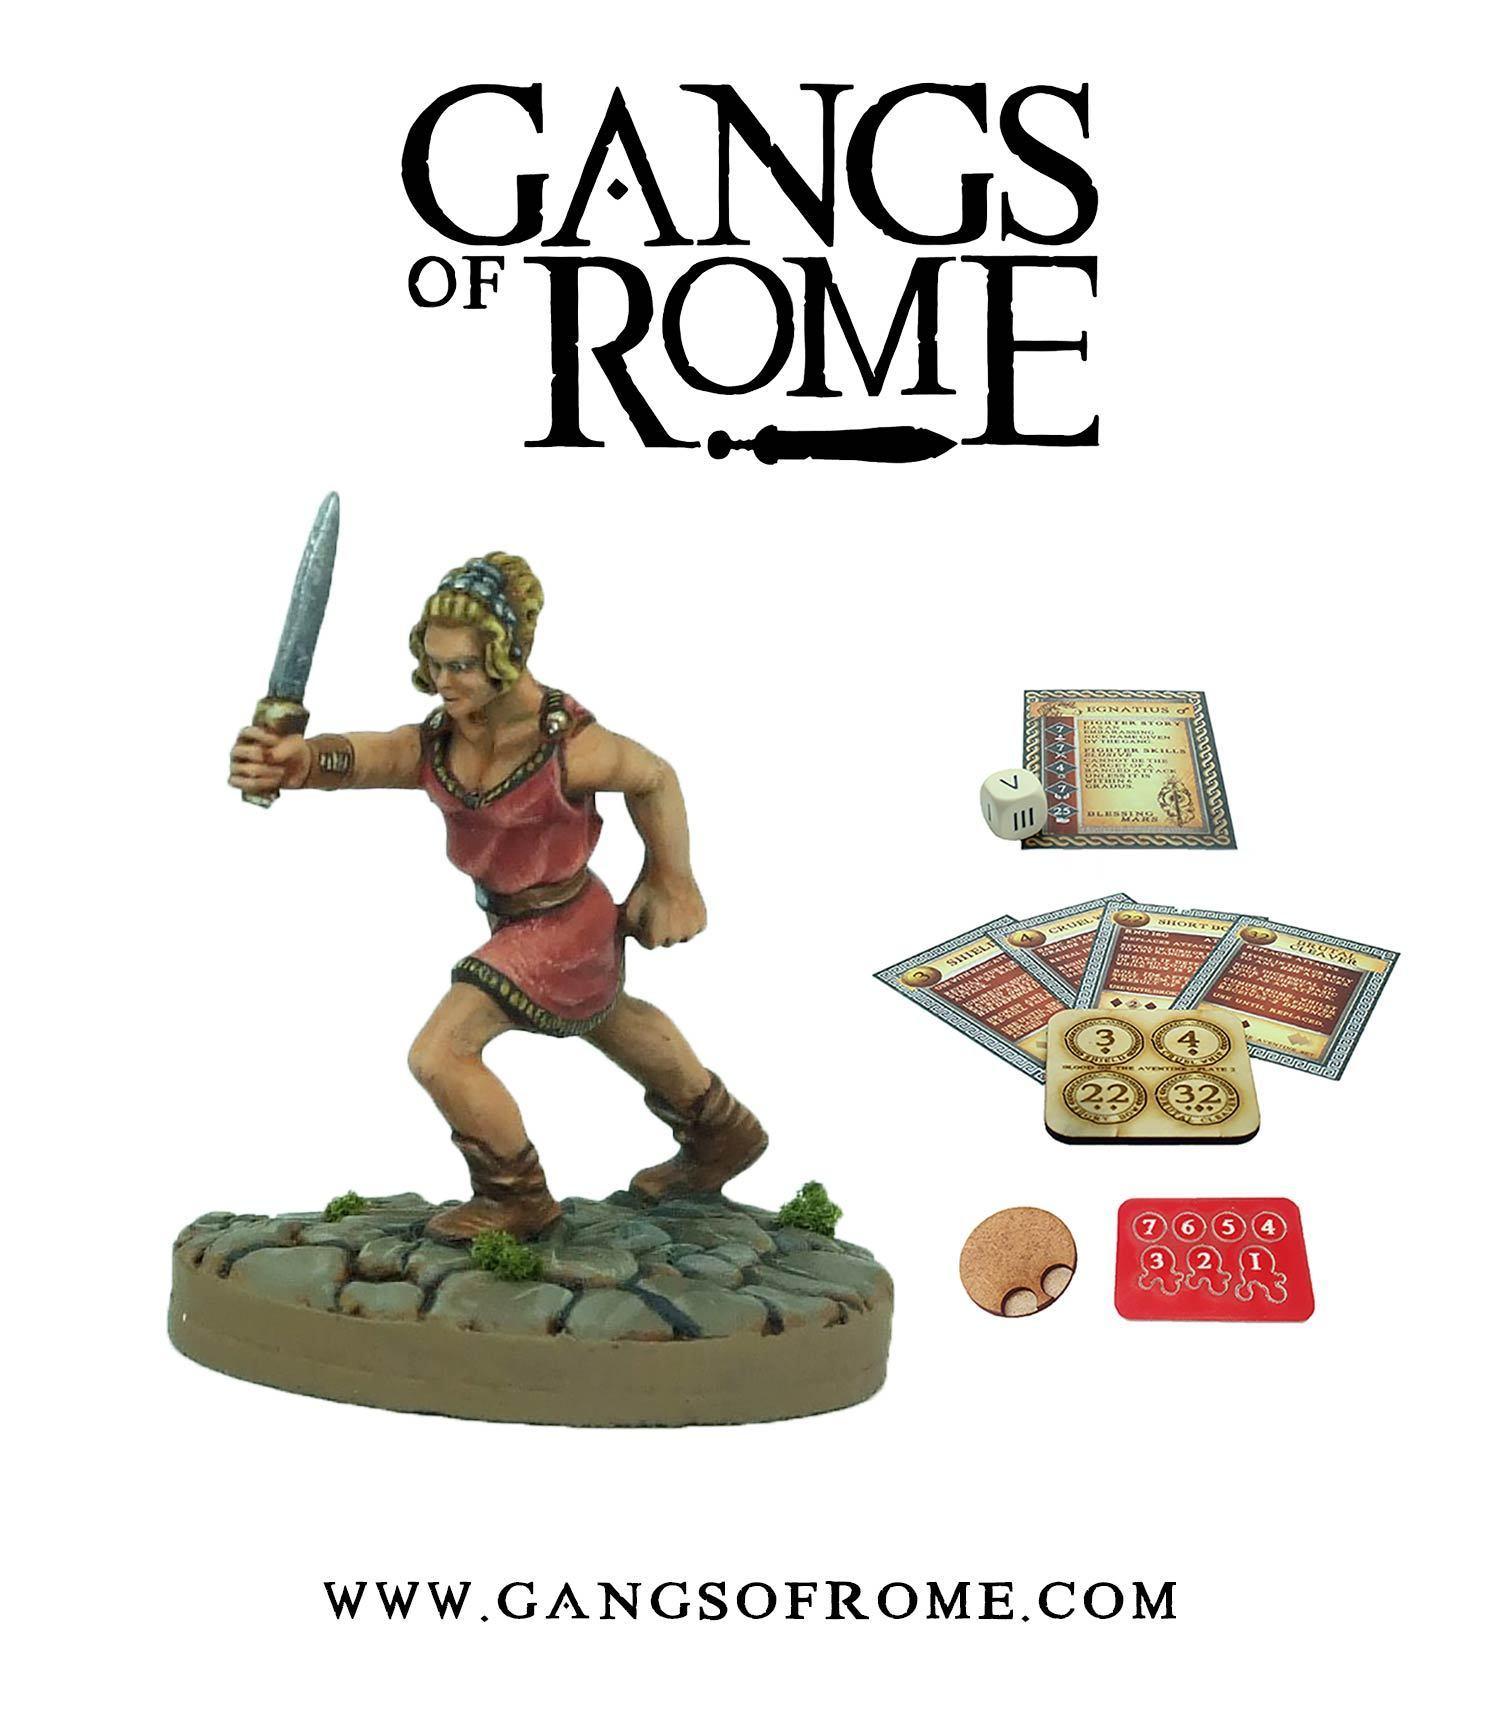 Fighter Decimus, Gangs of Rome